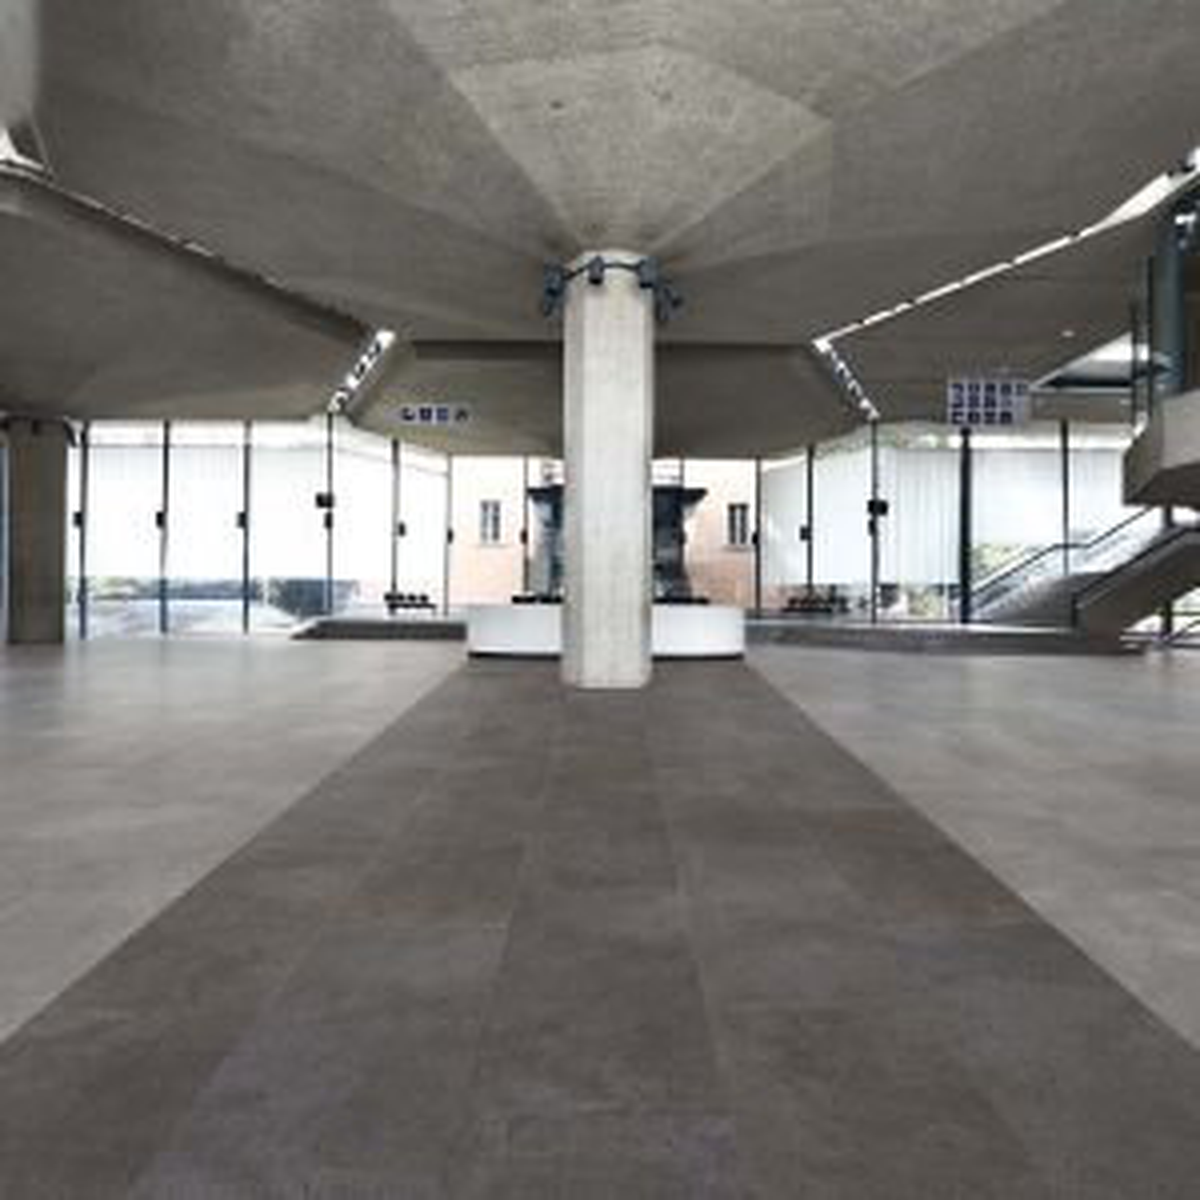 RAK Surface Copper Matt Tile 600 x 600mm Lifestyle